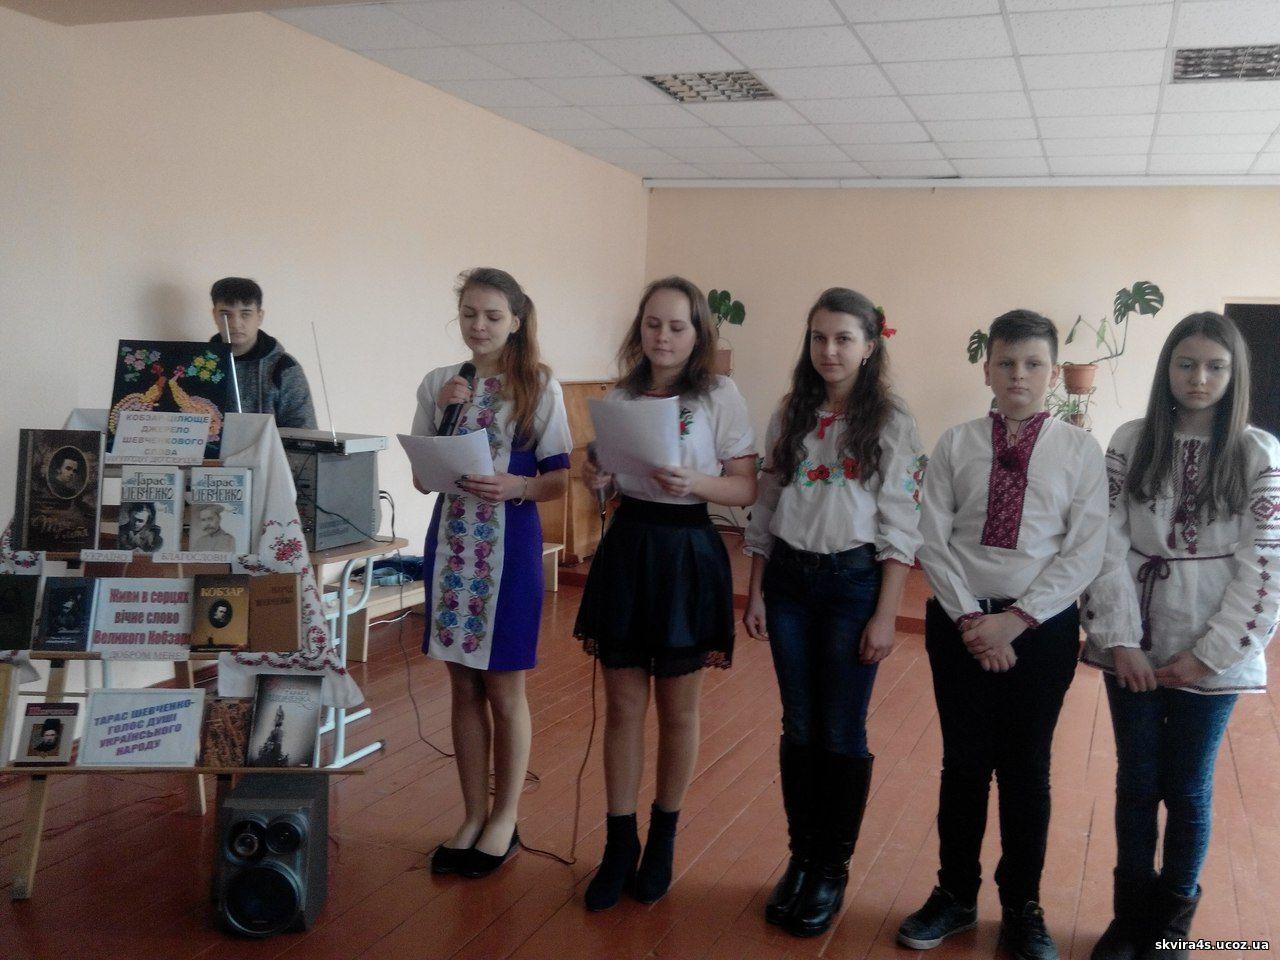 http://skvira4s.ucoz.ua/foto/09-03-17/u4sl4hTnbO4.jpg